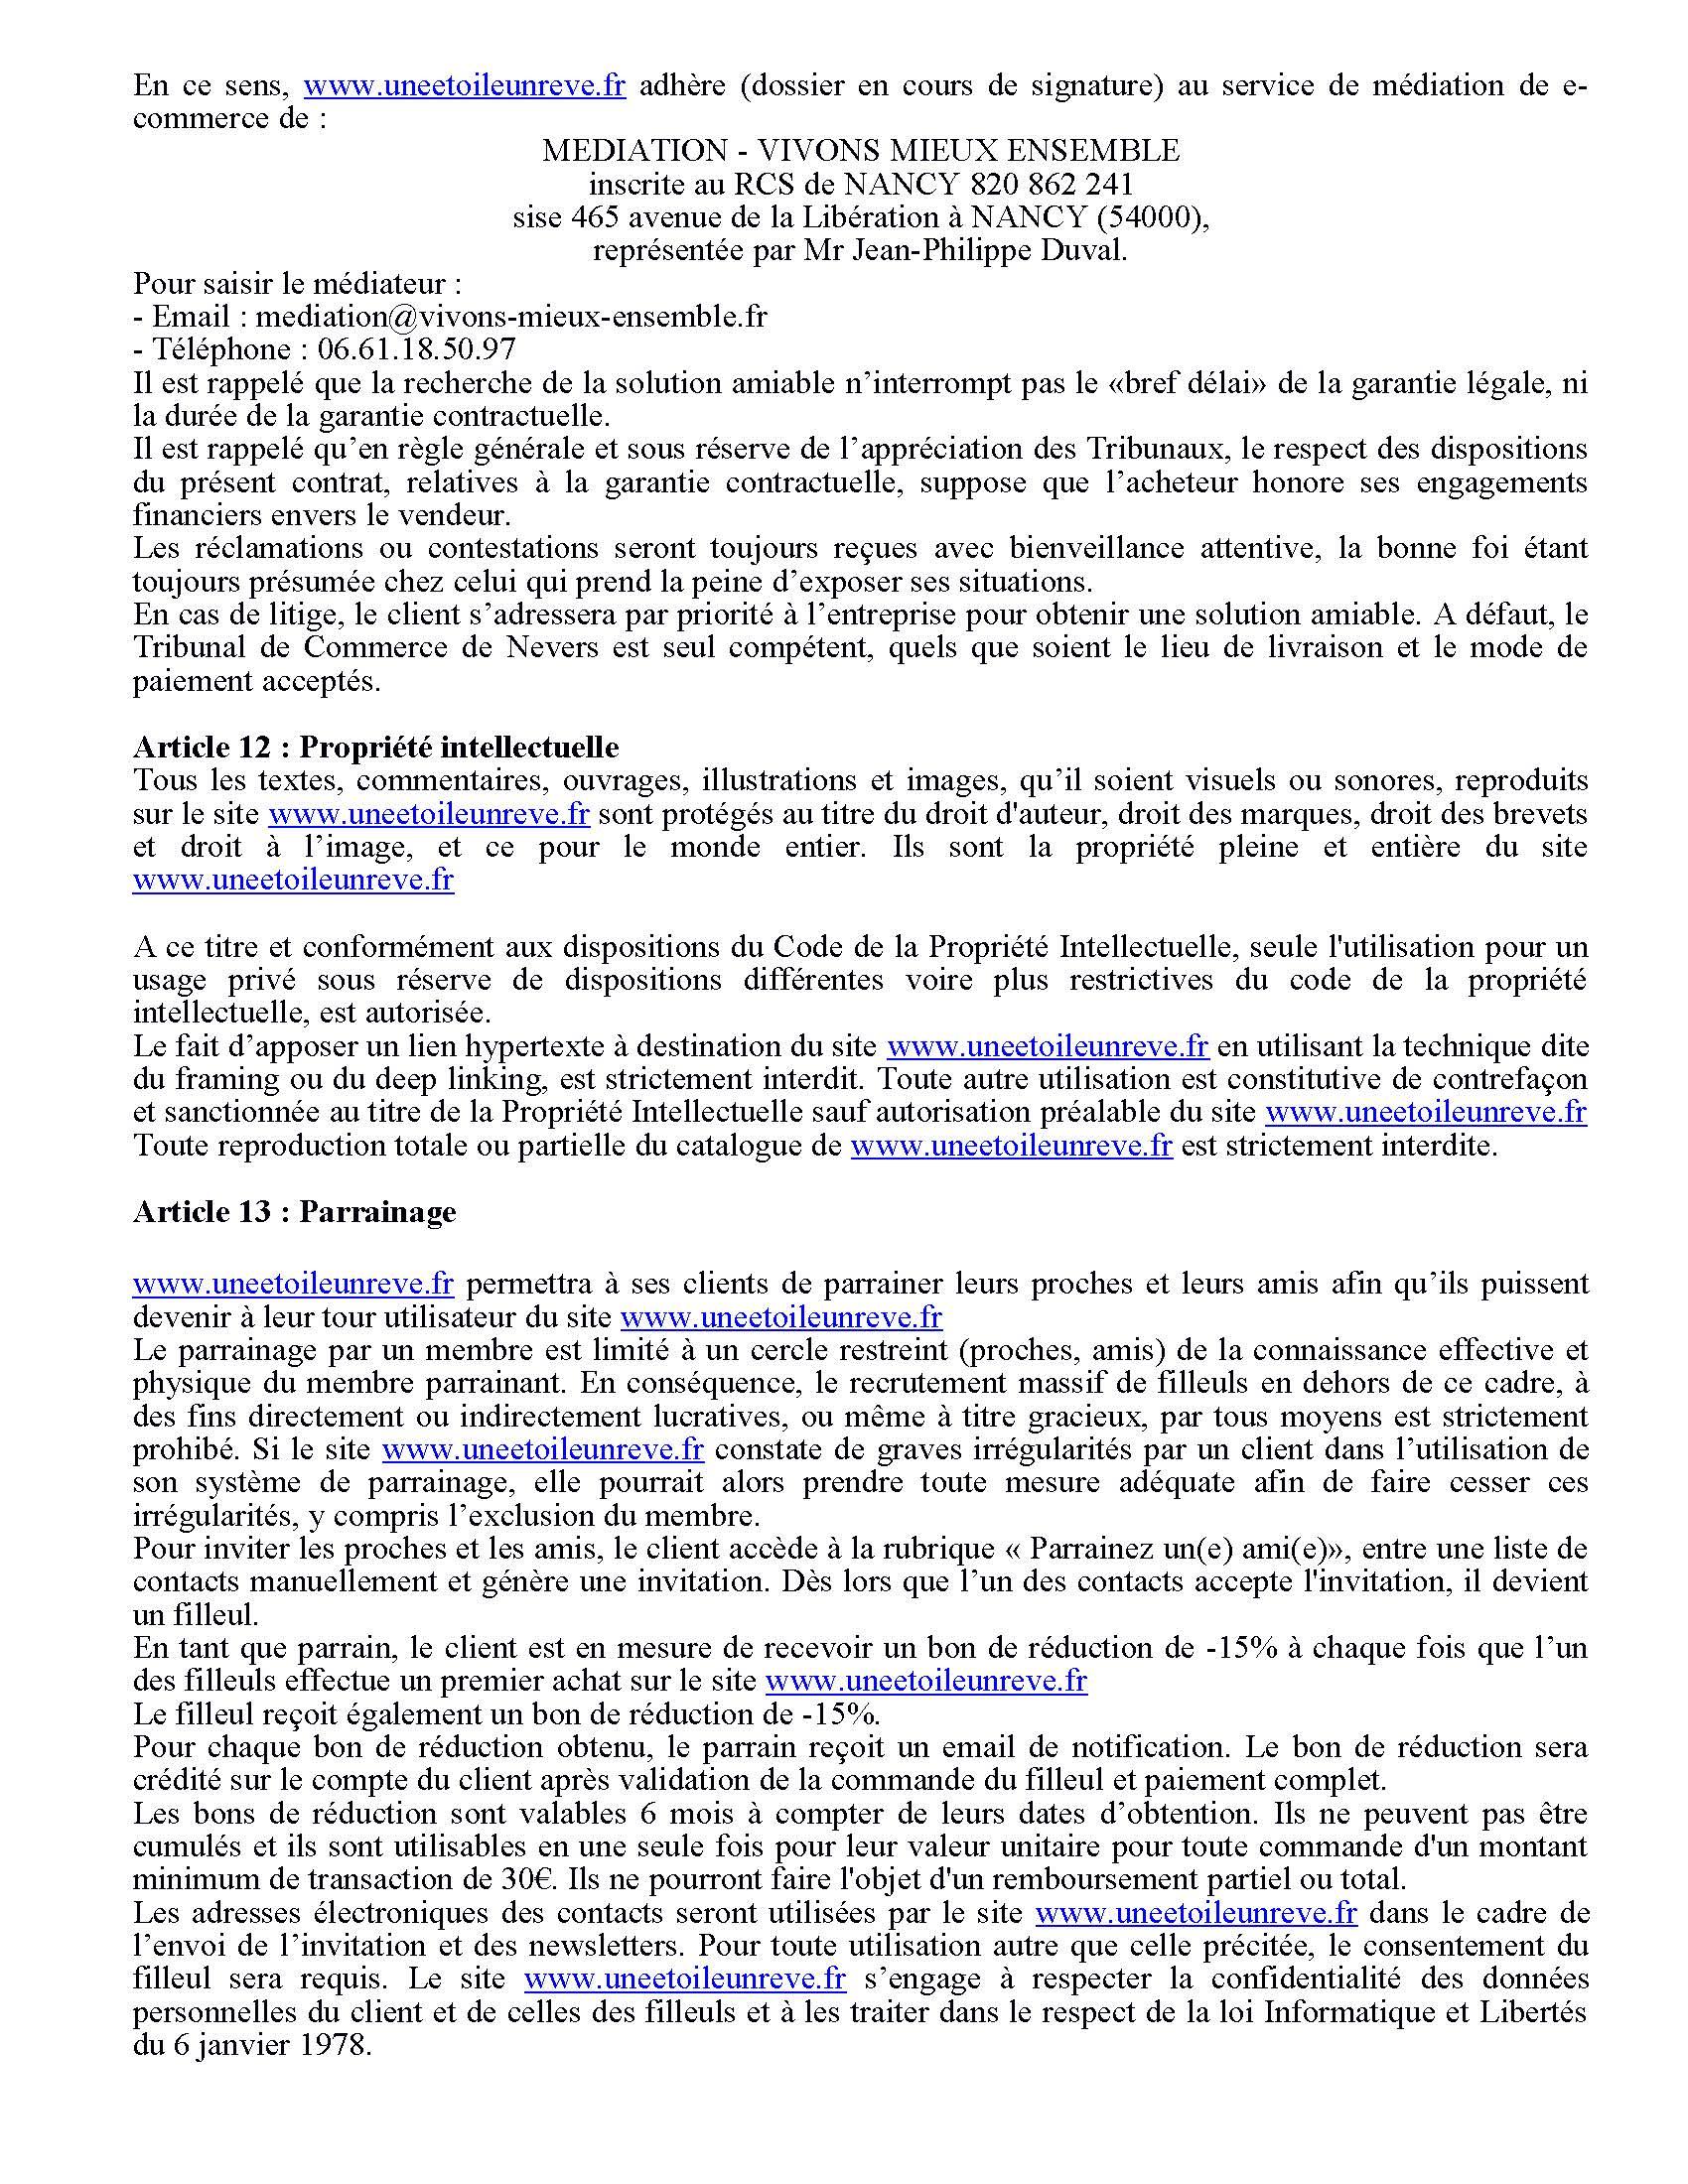 CGV_www.uneetoileunreve.fr_Page_14.jpg